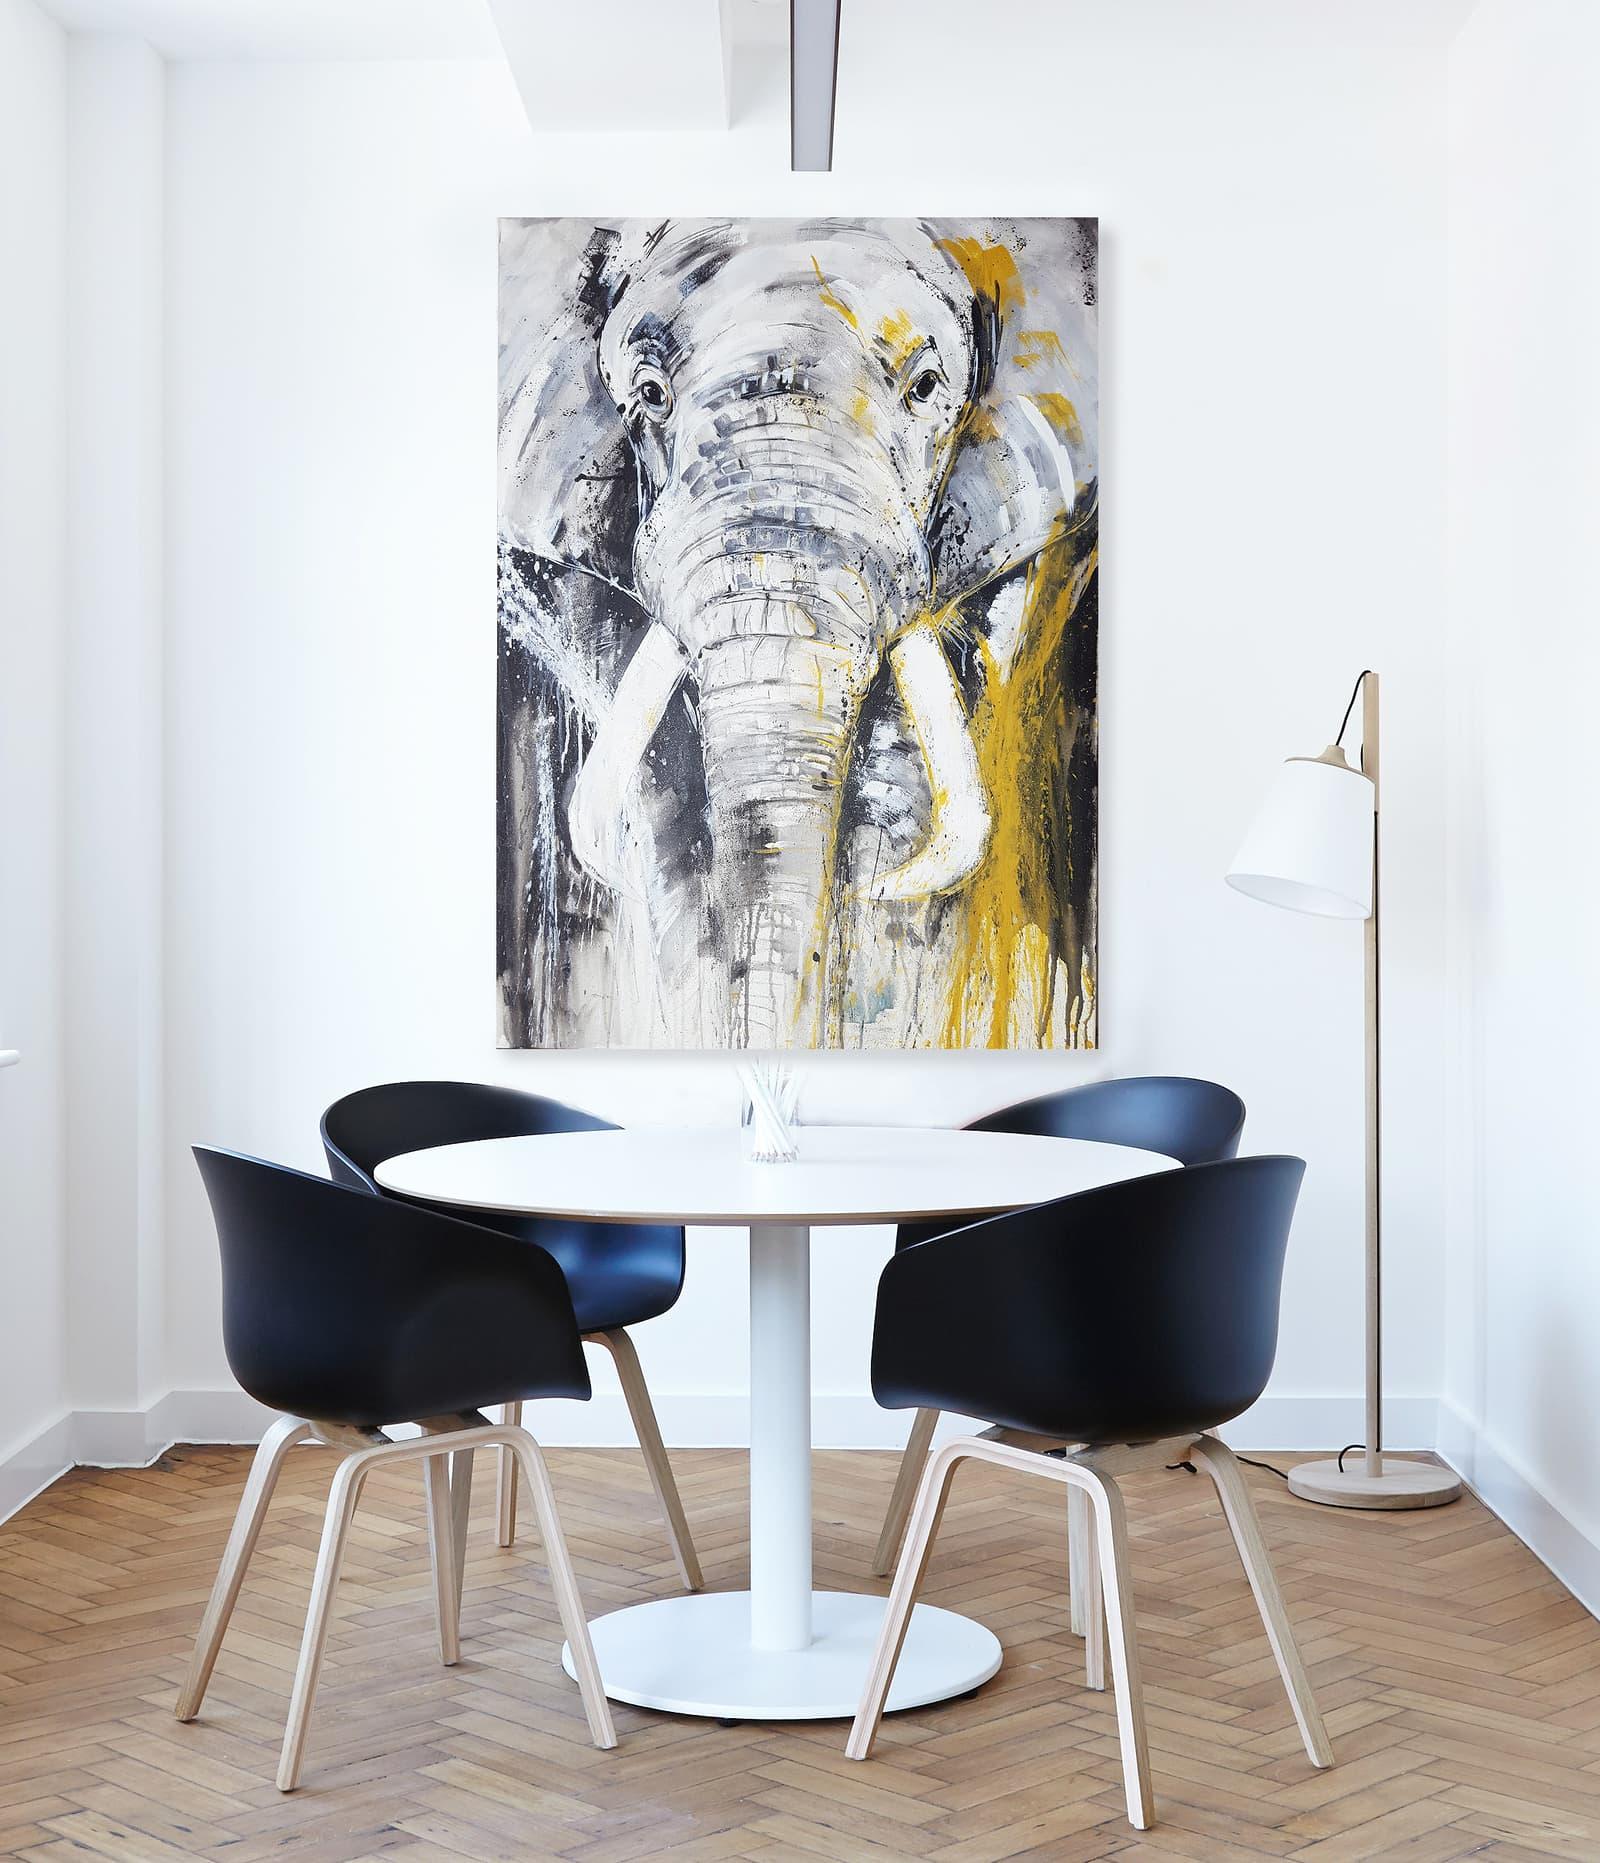 elefant 4 unikat auf leinwand atelier stefanie rogge. Black Bedroom Furniture Sets. Home Design Ideas